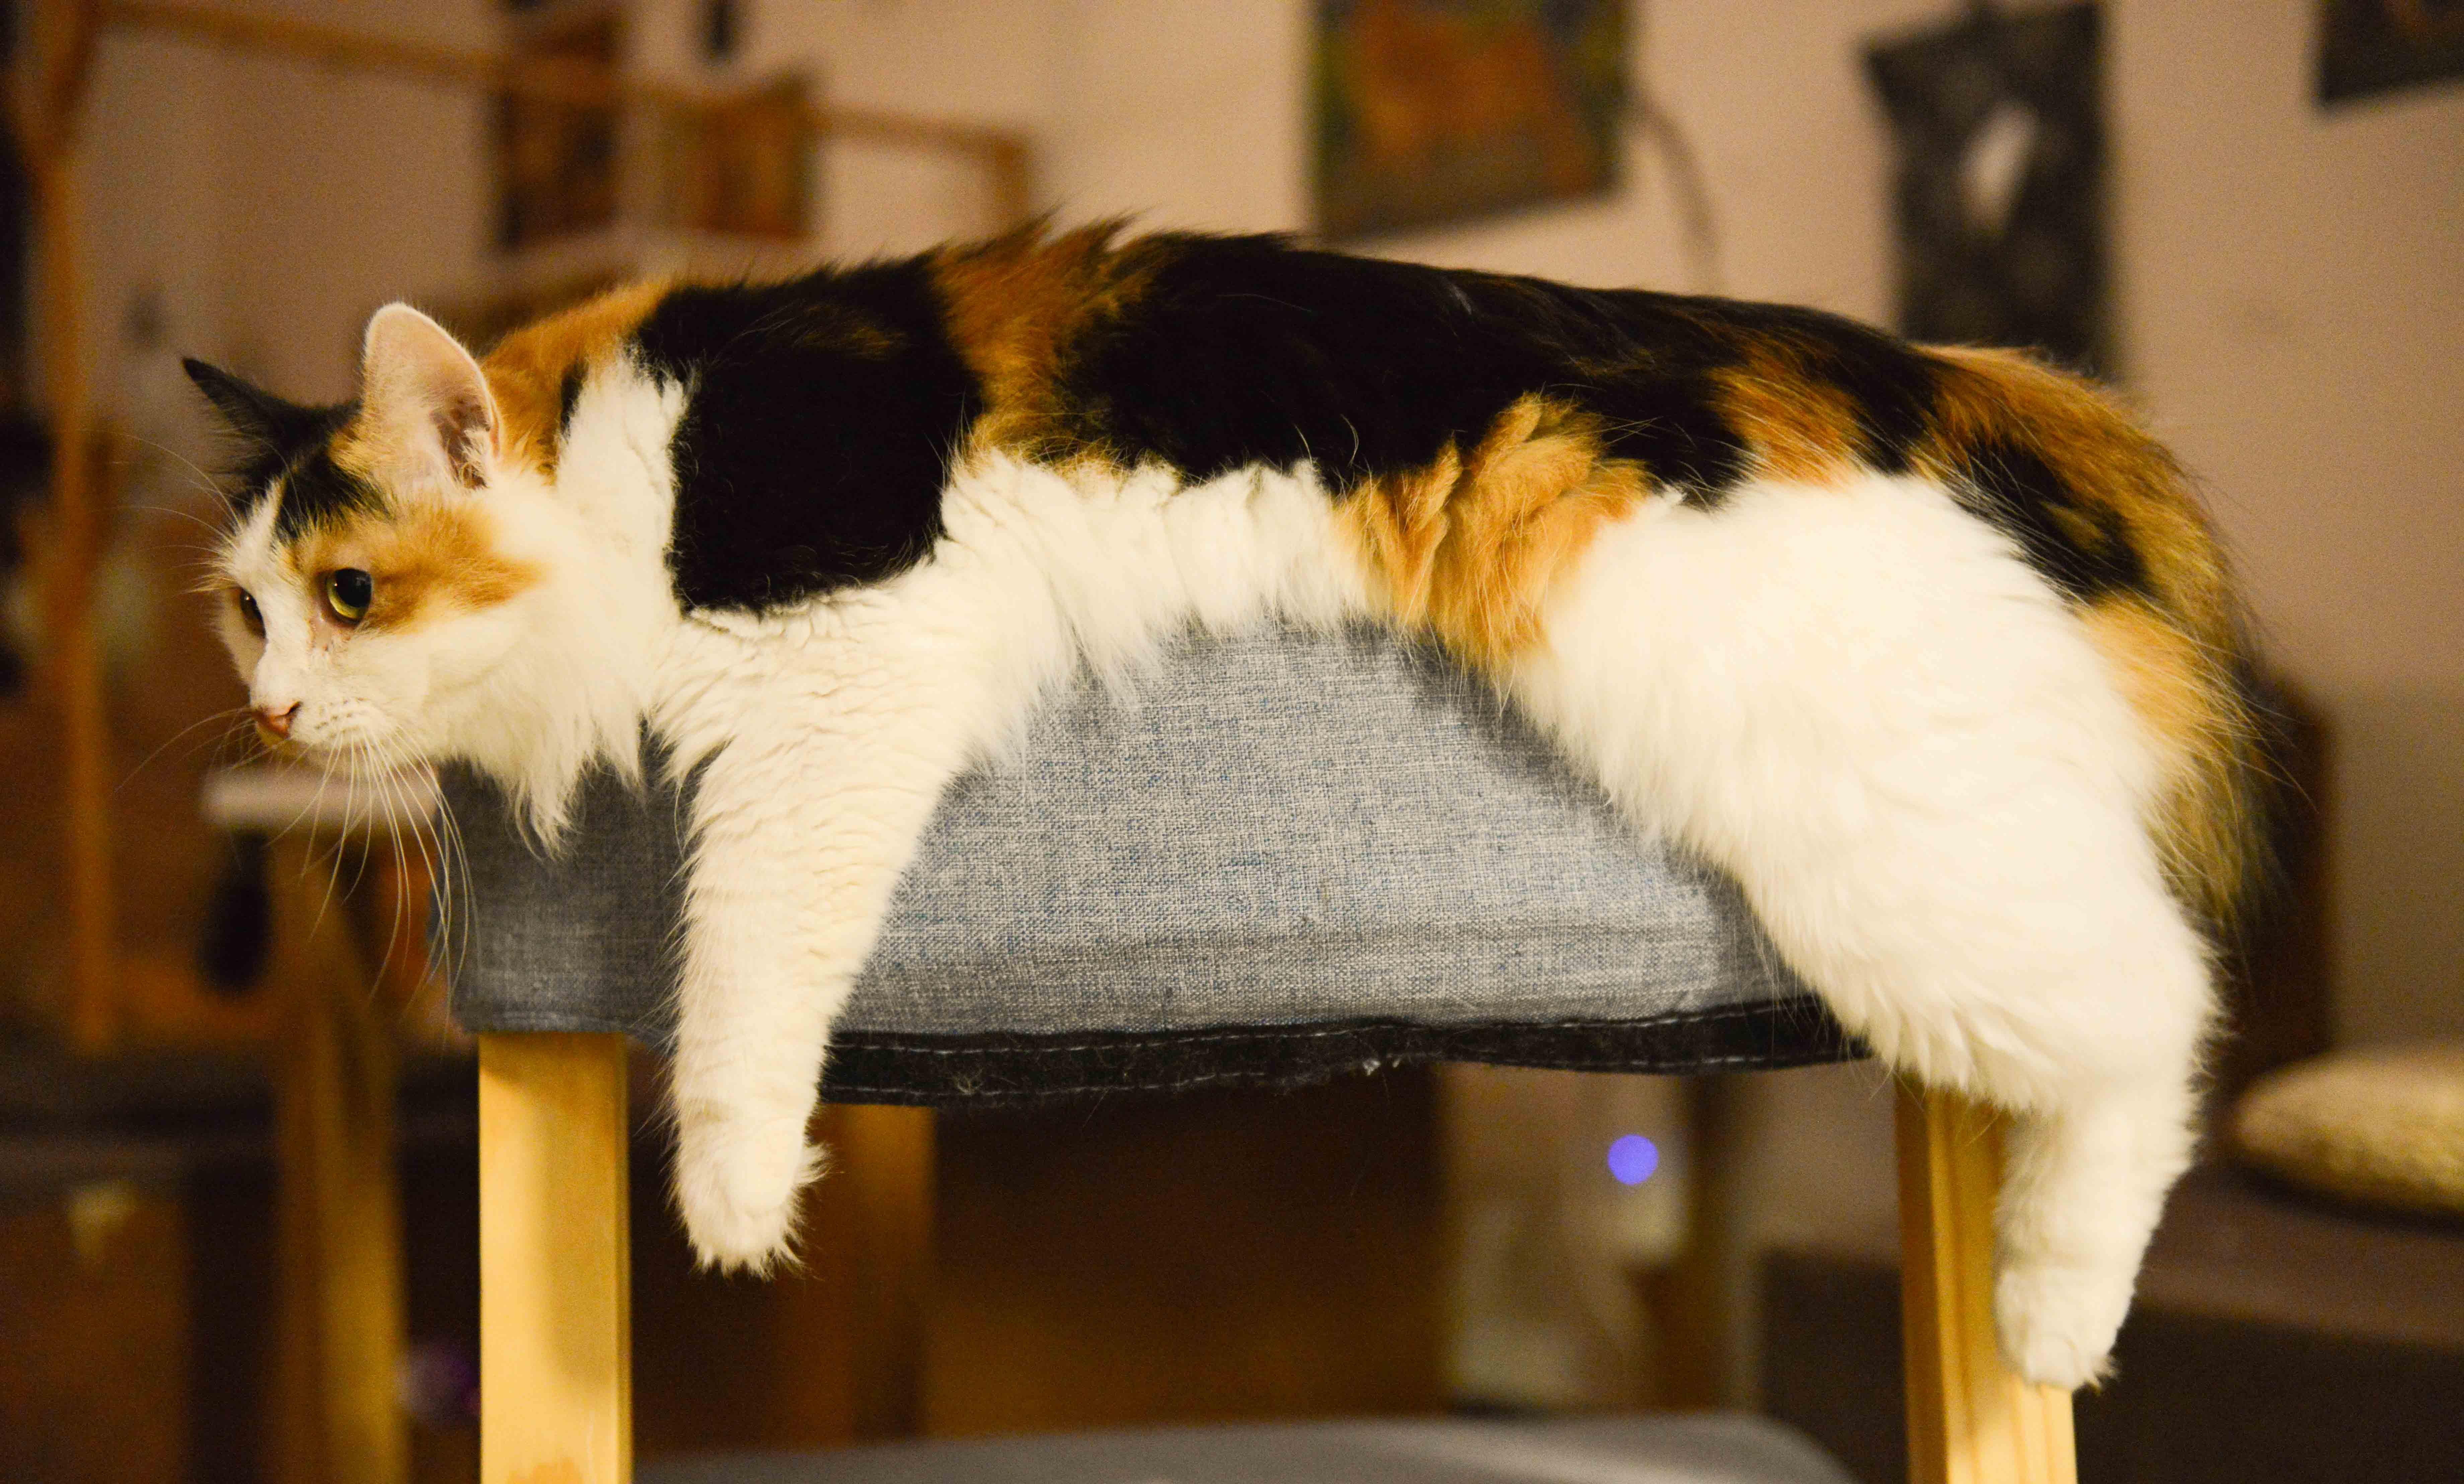 Black And Gray Wallpaper Himalayan Cat Sitting On Orange Sofa Chair During Daytime